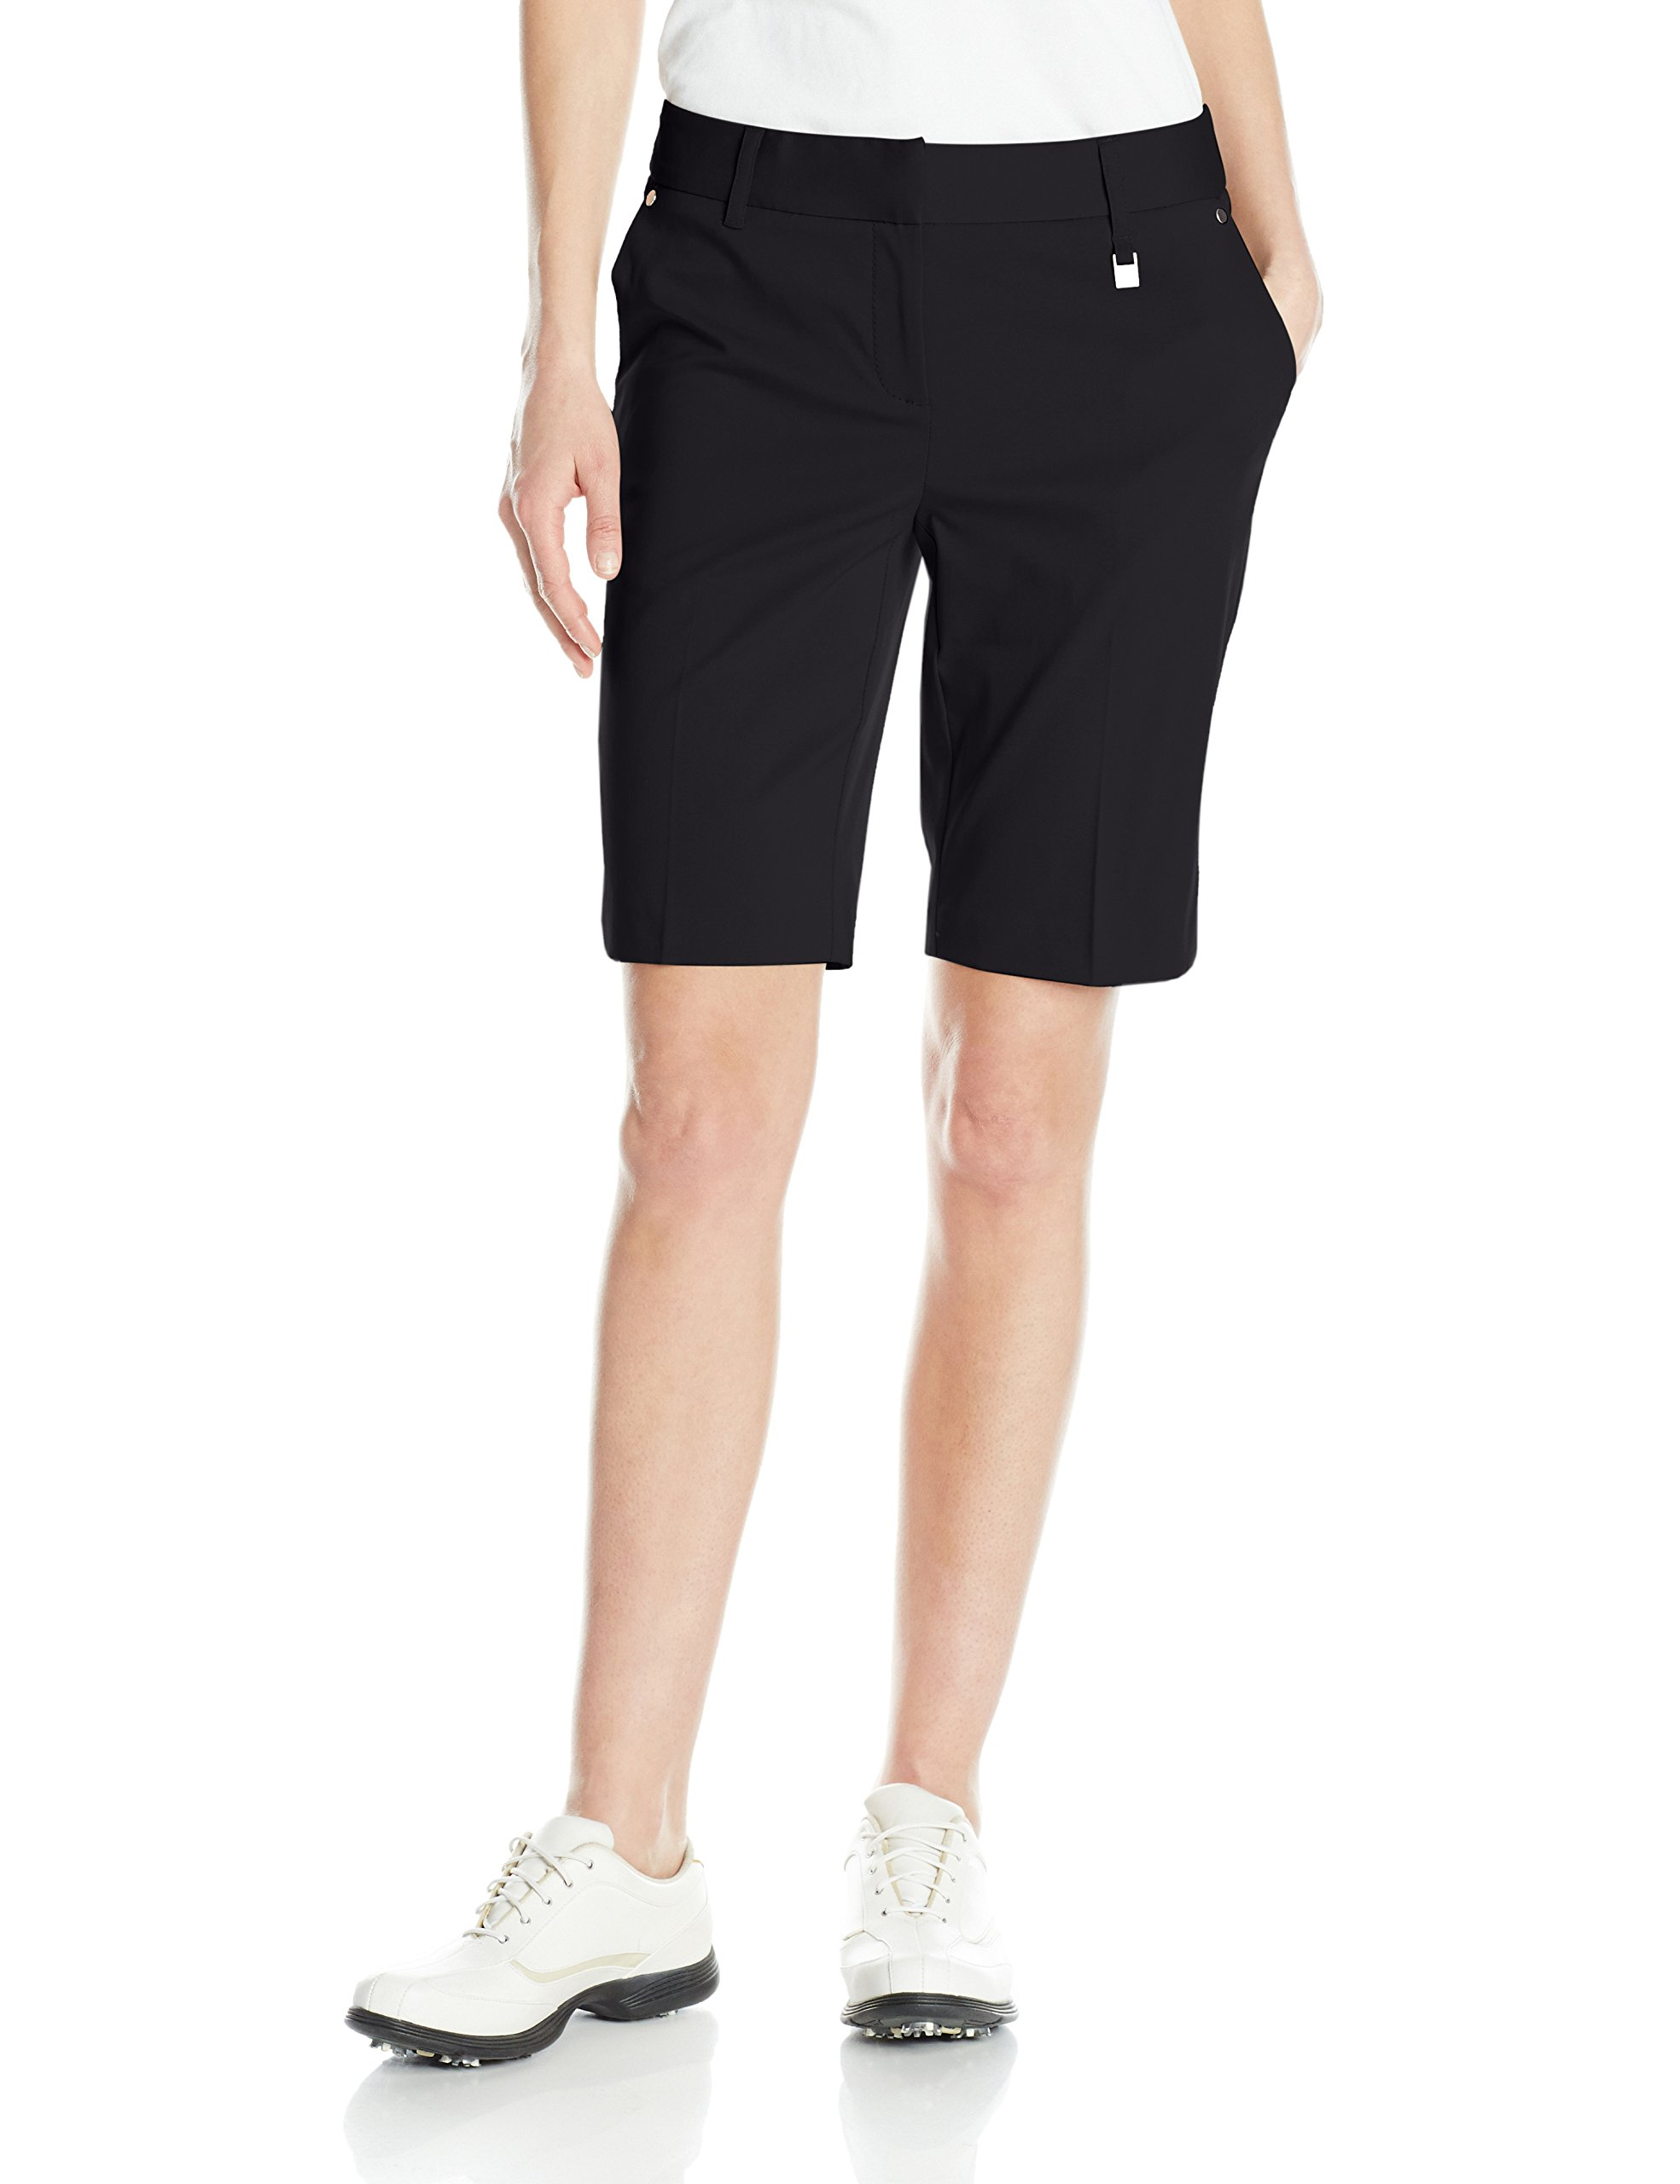 Cutter & Buck Women's CB Drytec Coast Short, Black, 2